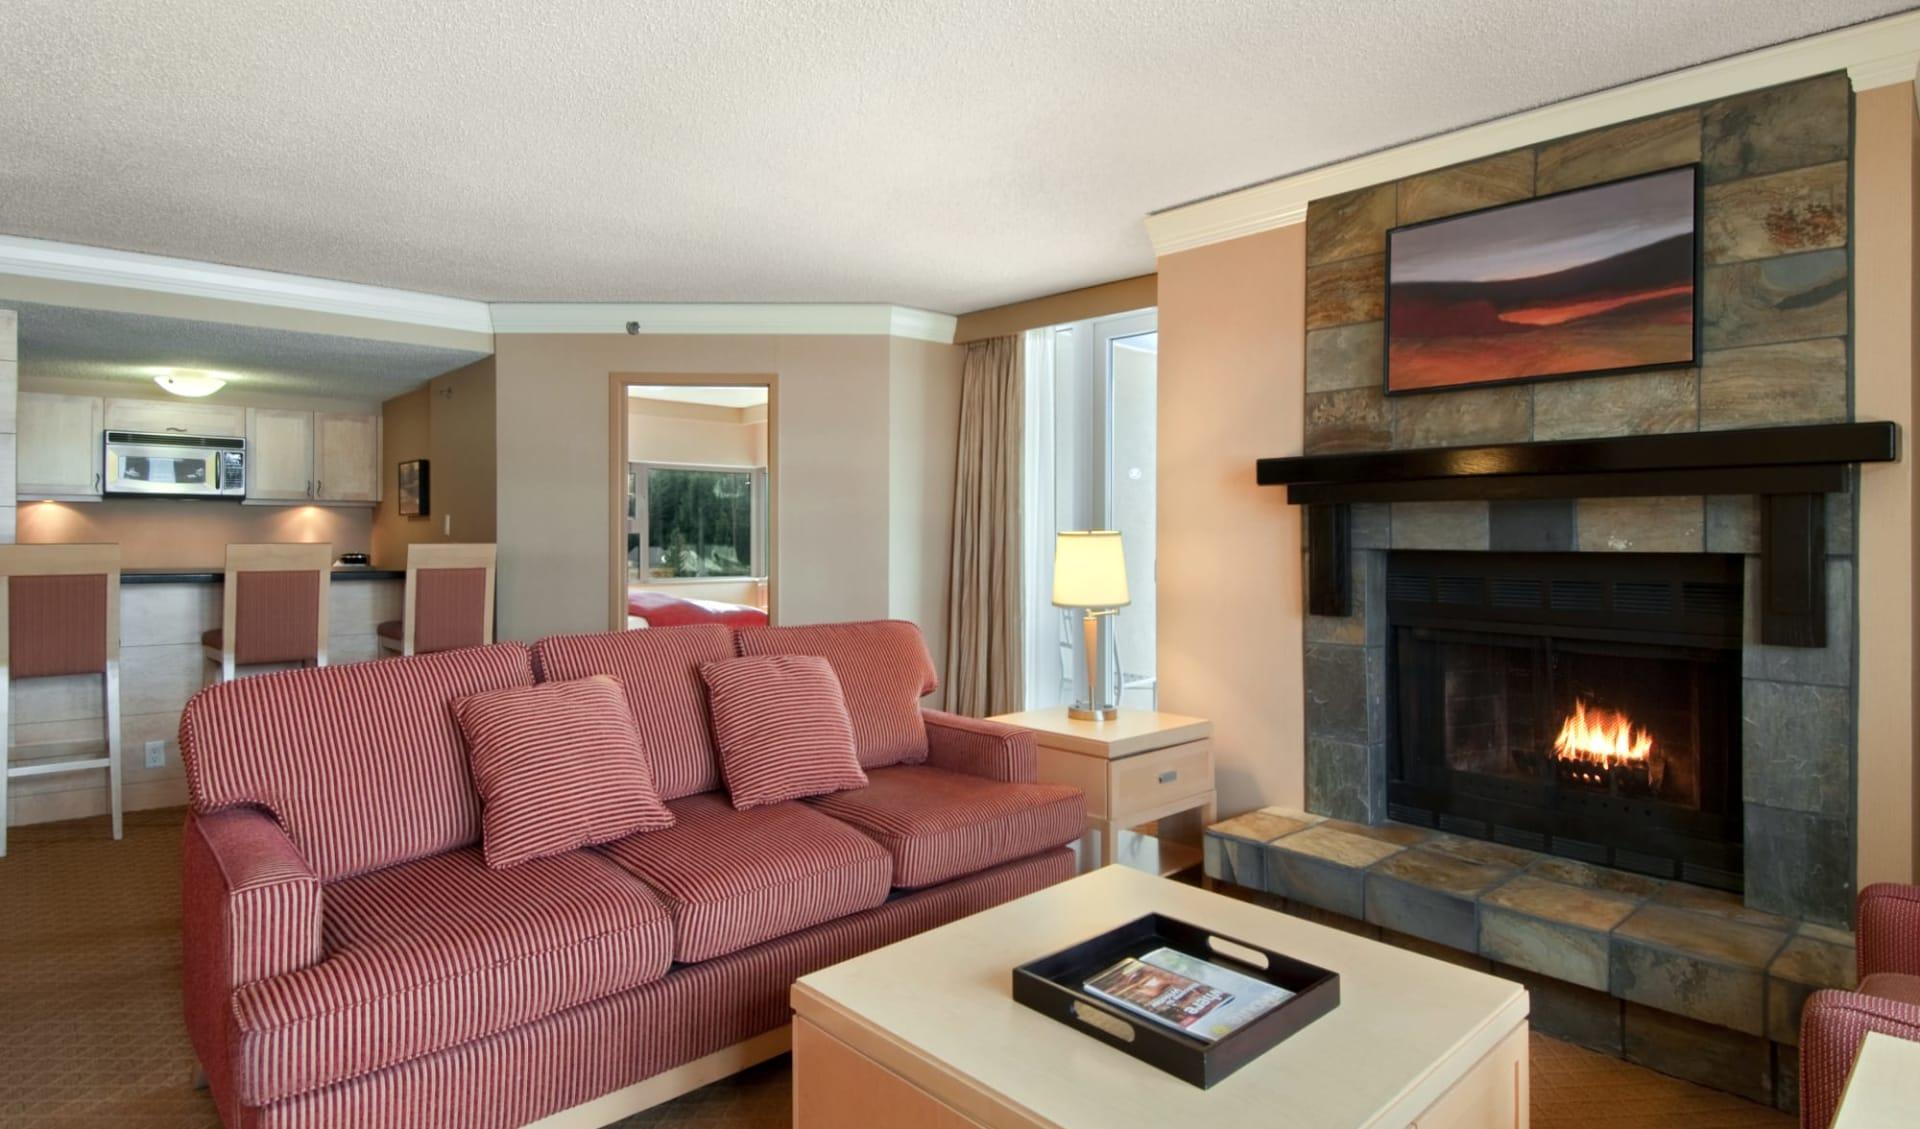 Hilton Whistler Resort & Spa:  Hilton Whistler Resort & Spa_Alpine2BedroomLivingRoom